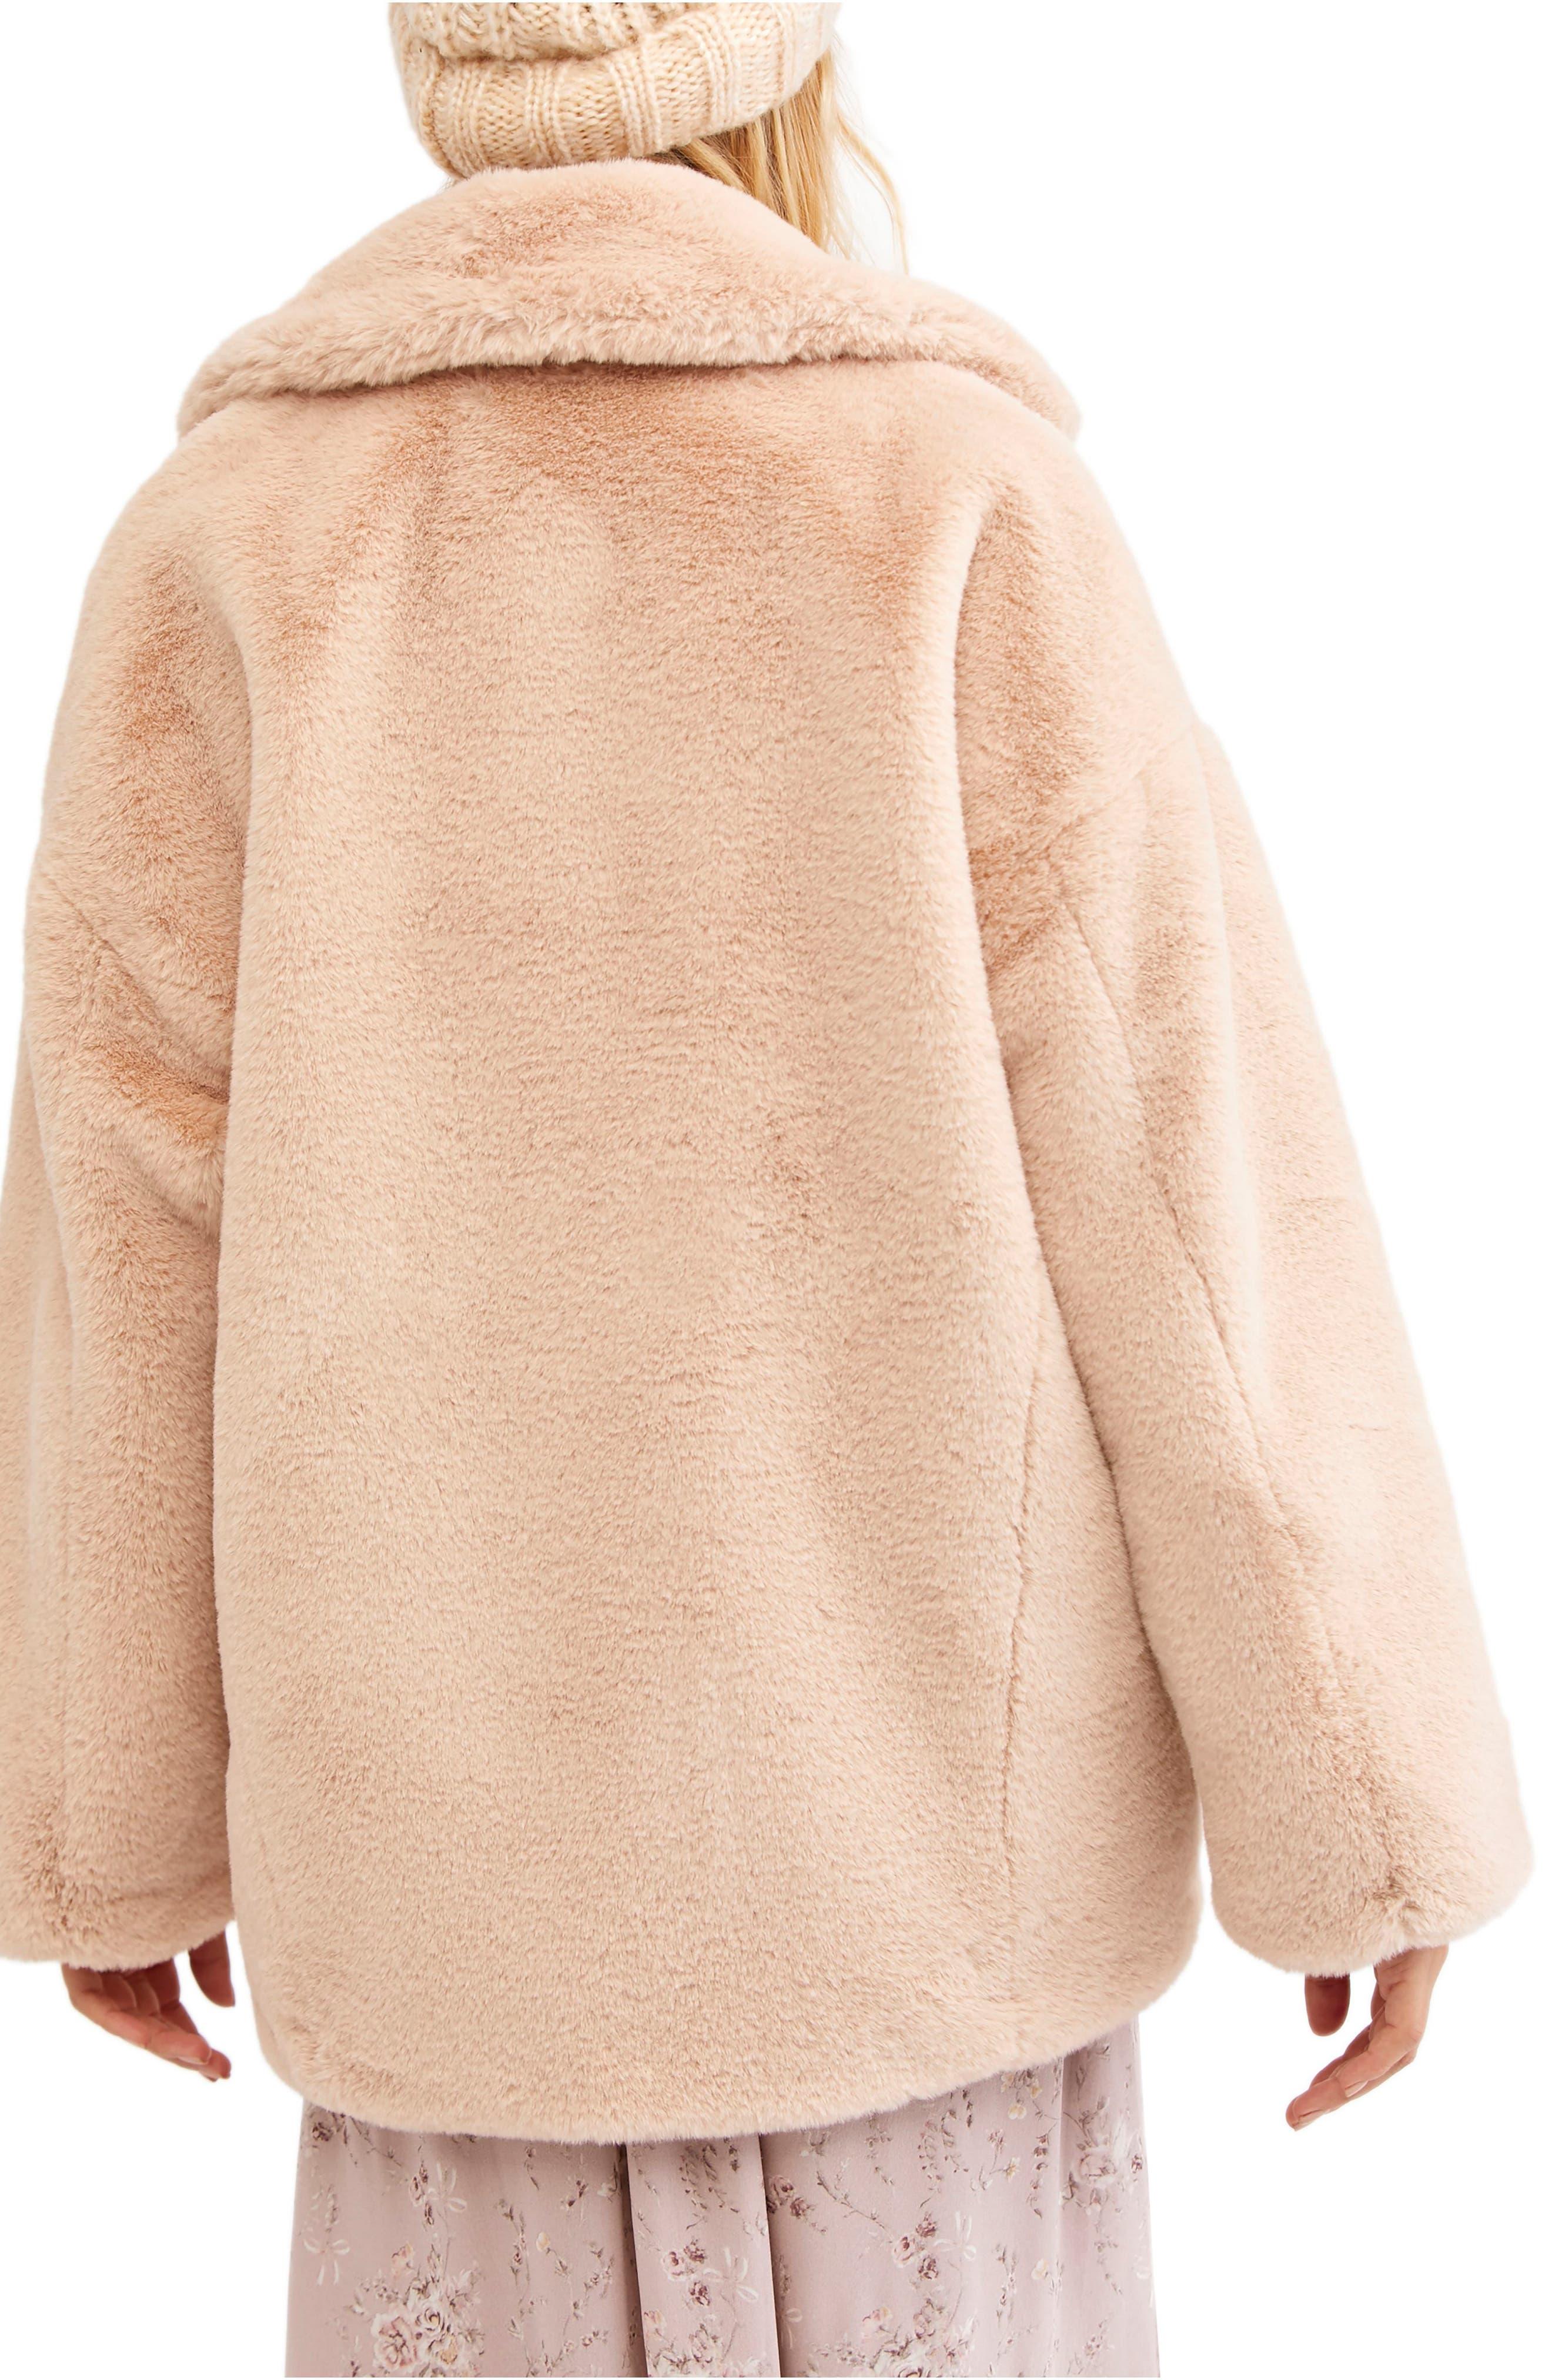 Kate Faux Fur Coat,                             Alternate thumbnail 2, color,                             ROSE